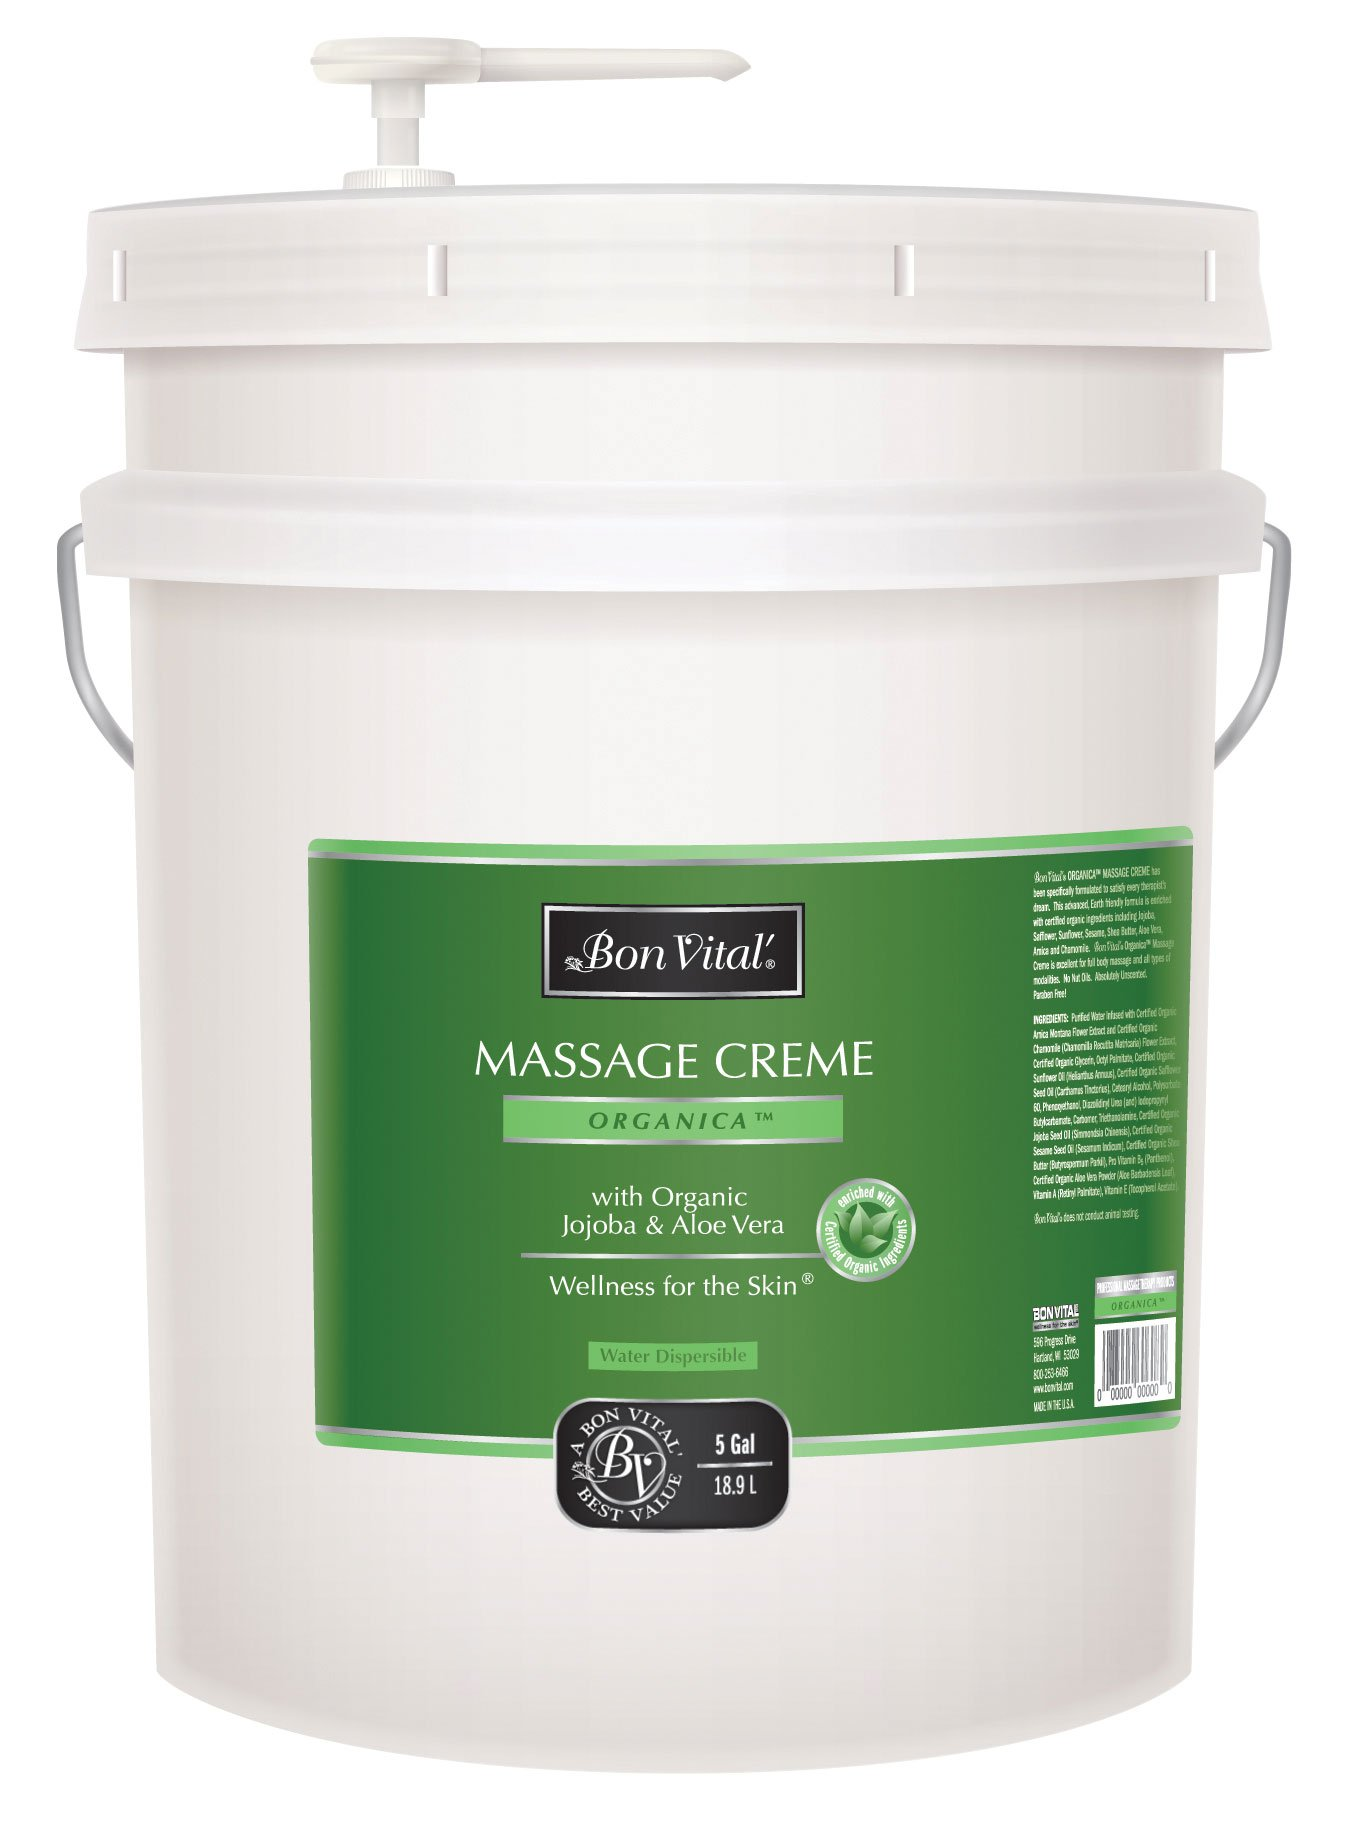 Bon Vital Organica Massage Creme, 5 Gallon Pail